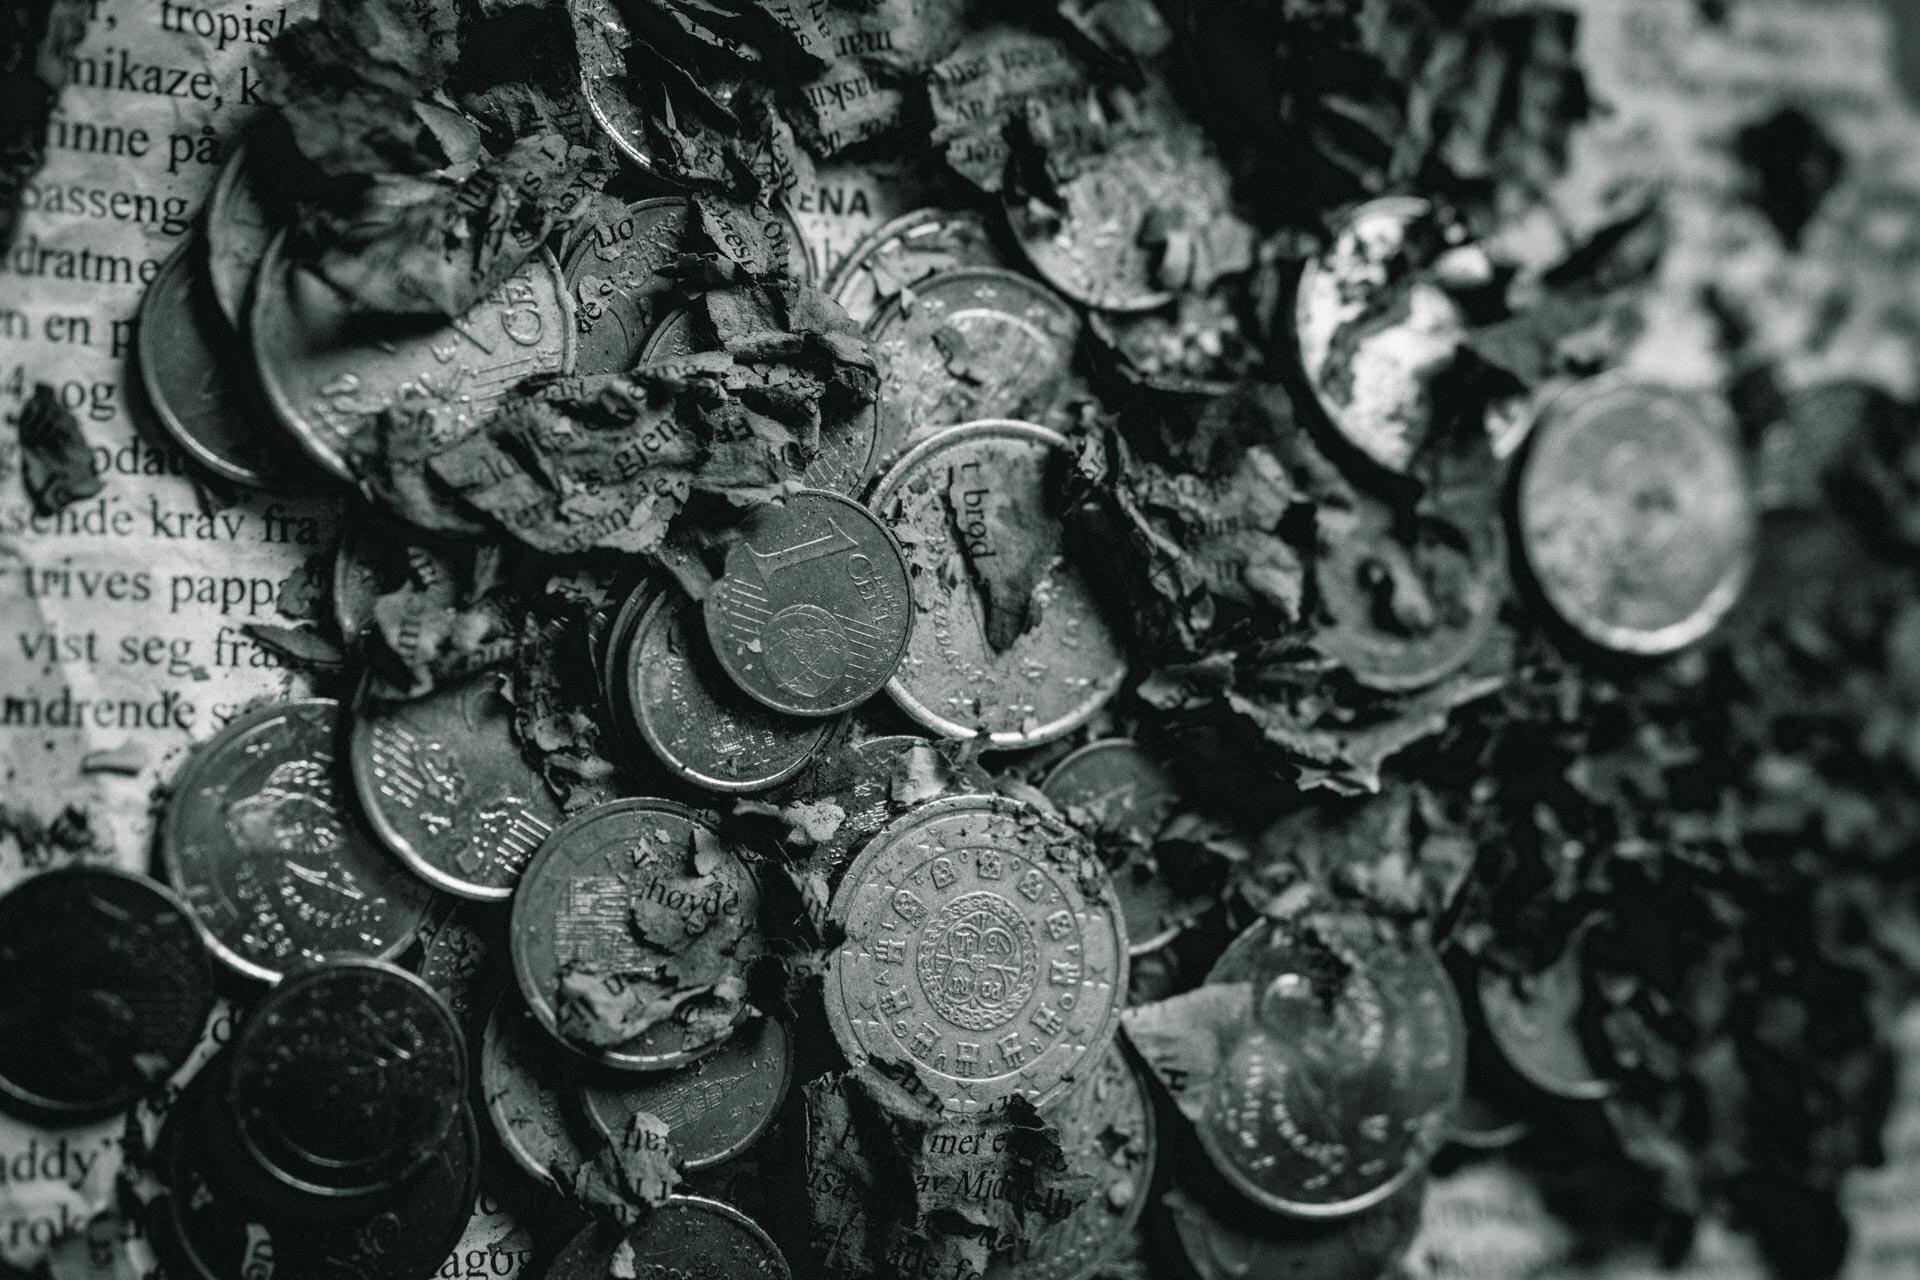 BPP 12 - Coins - IG-8.jpg